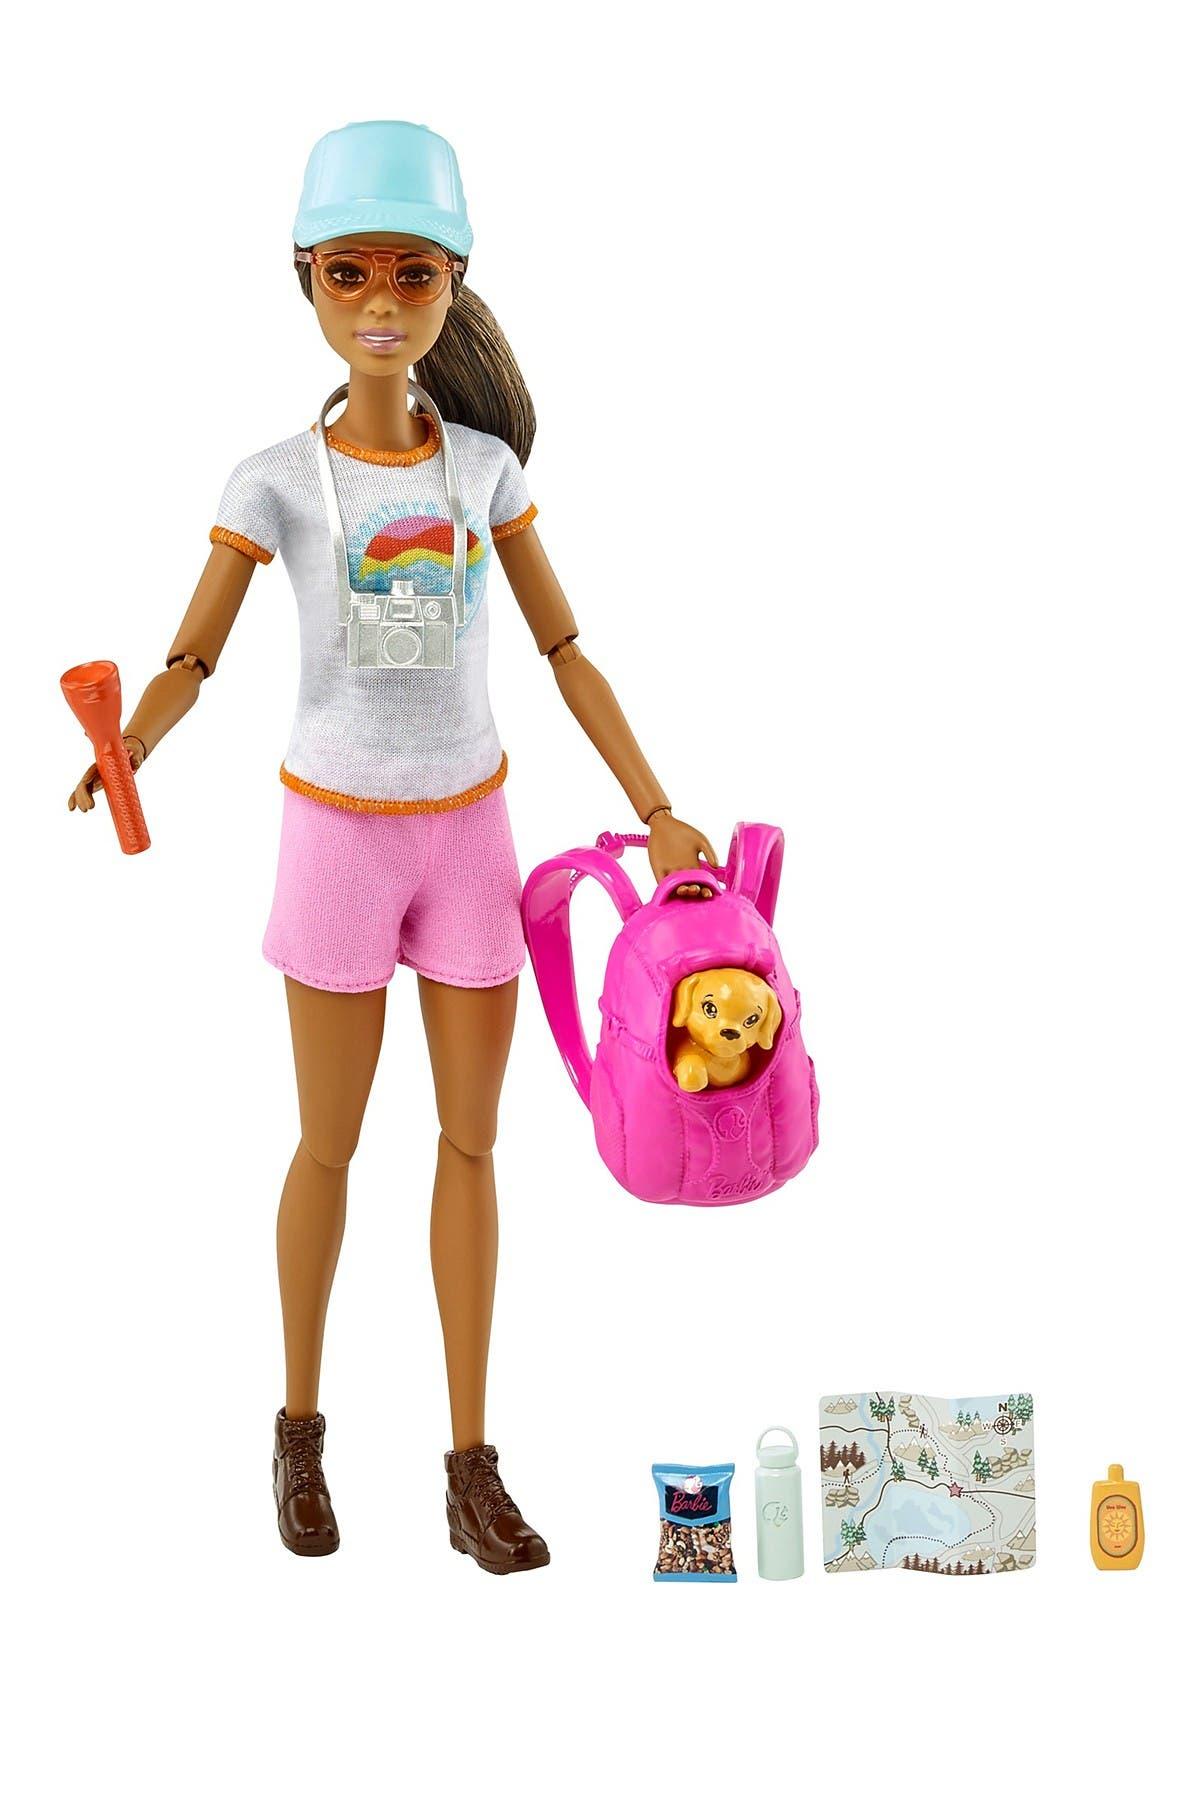 Image of Mattel Barbie Wellness Doll - Hiker